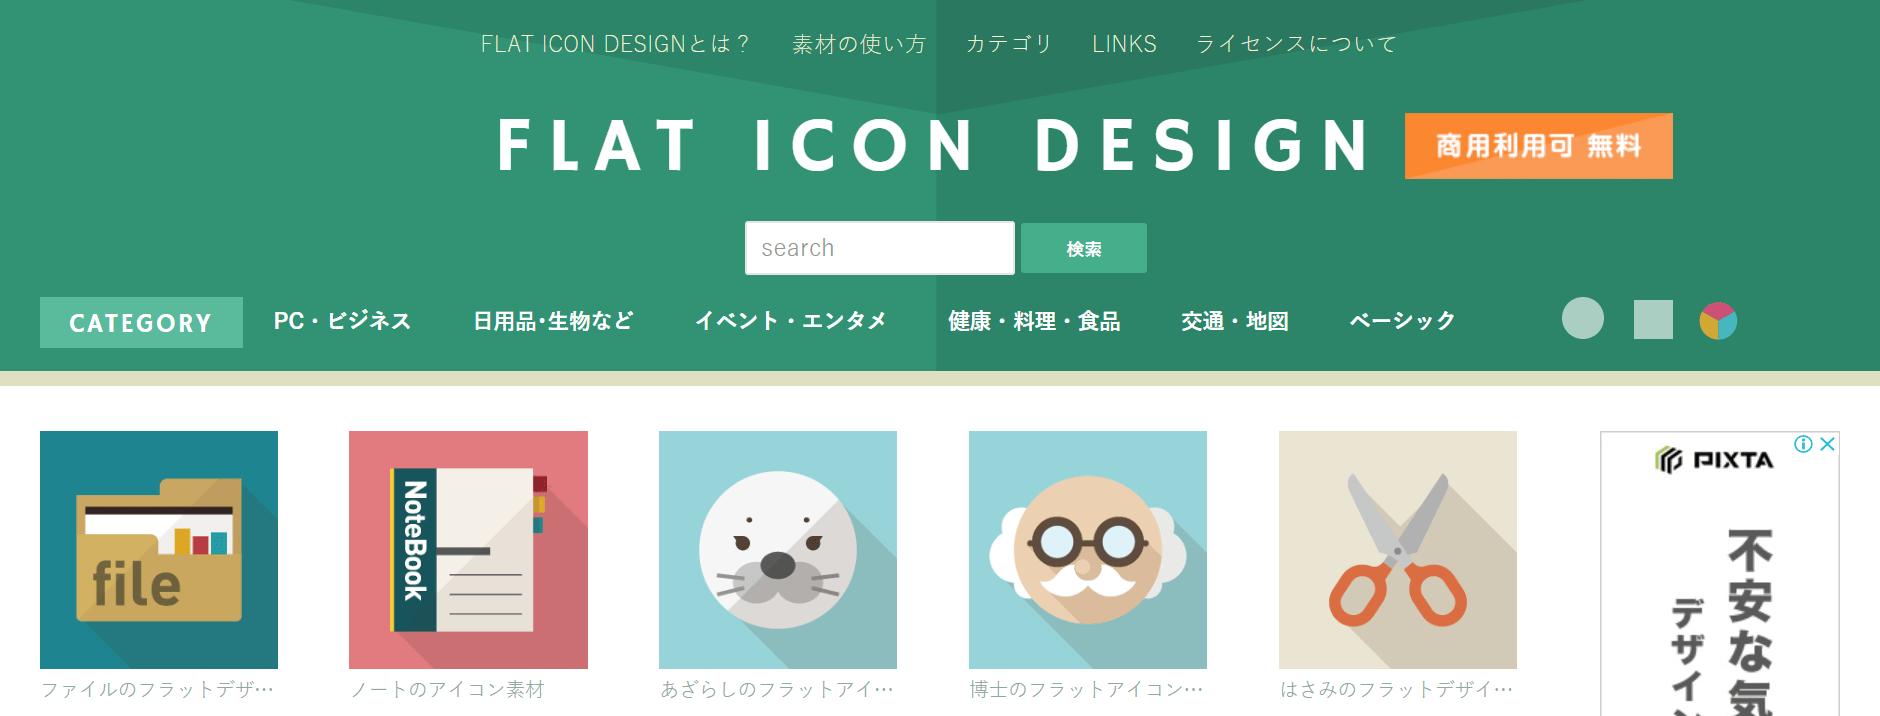 FLAT ICON DESIGNトップ画面